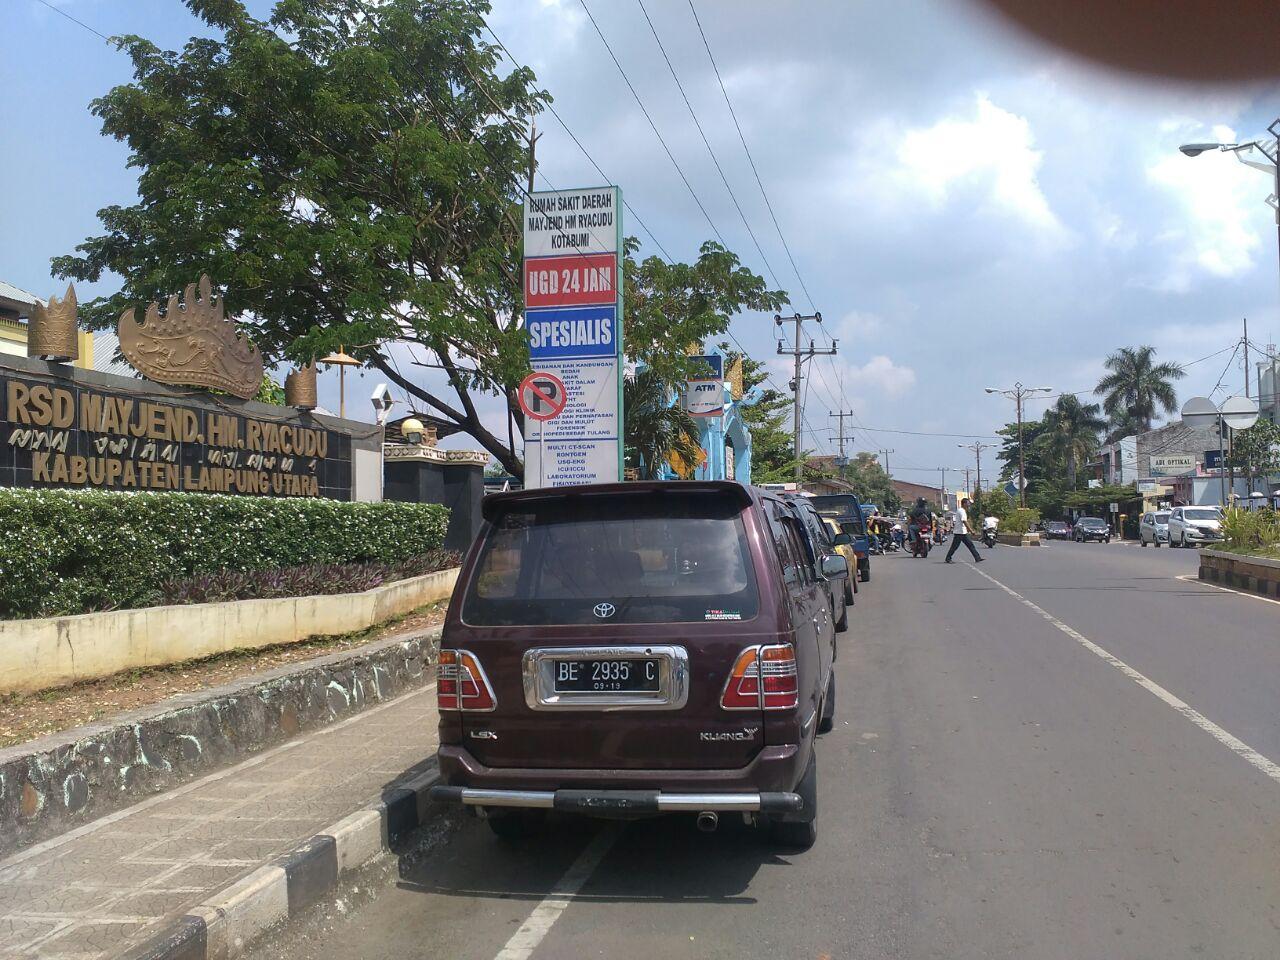 Mobil Parkir di Badan Jalan Depan RSUD Ryacudu Ganggu Pengguna Jalan